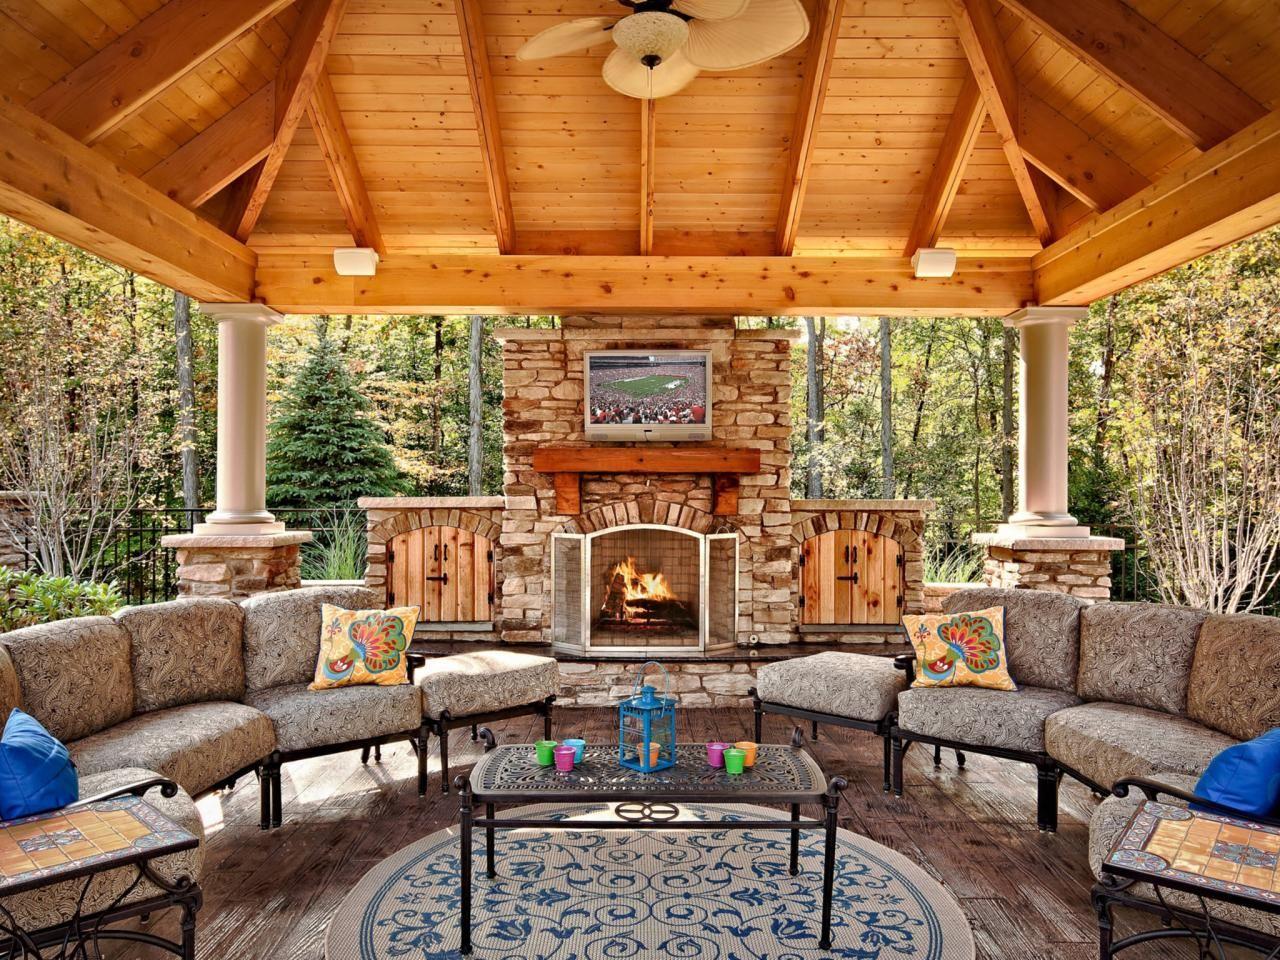 Outdoor Fireplace Plans Outdoor Fireplace Plans Outdoor Rooms Patio